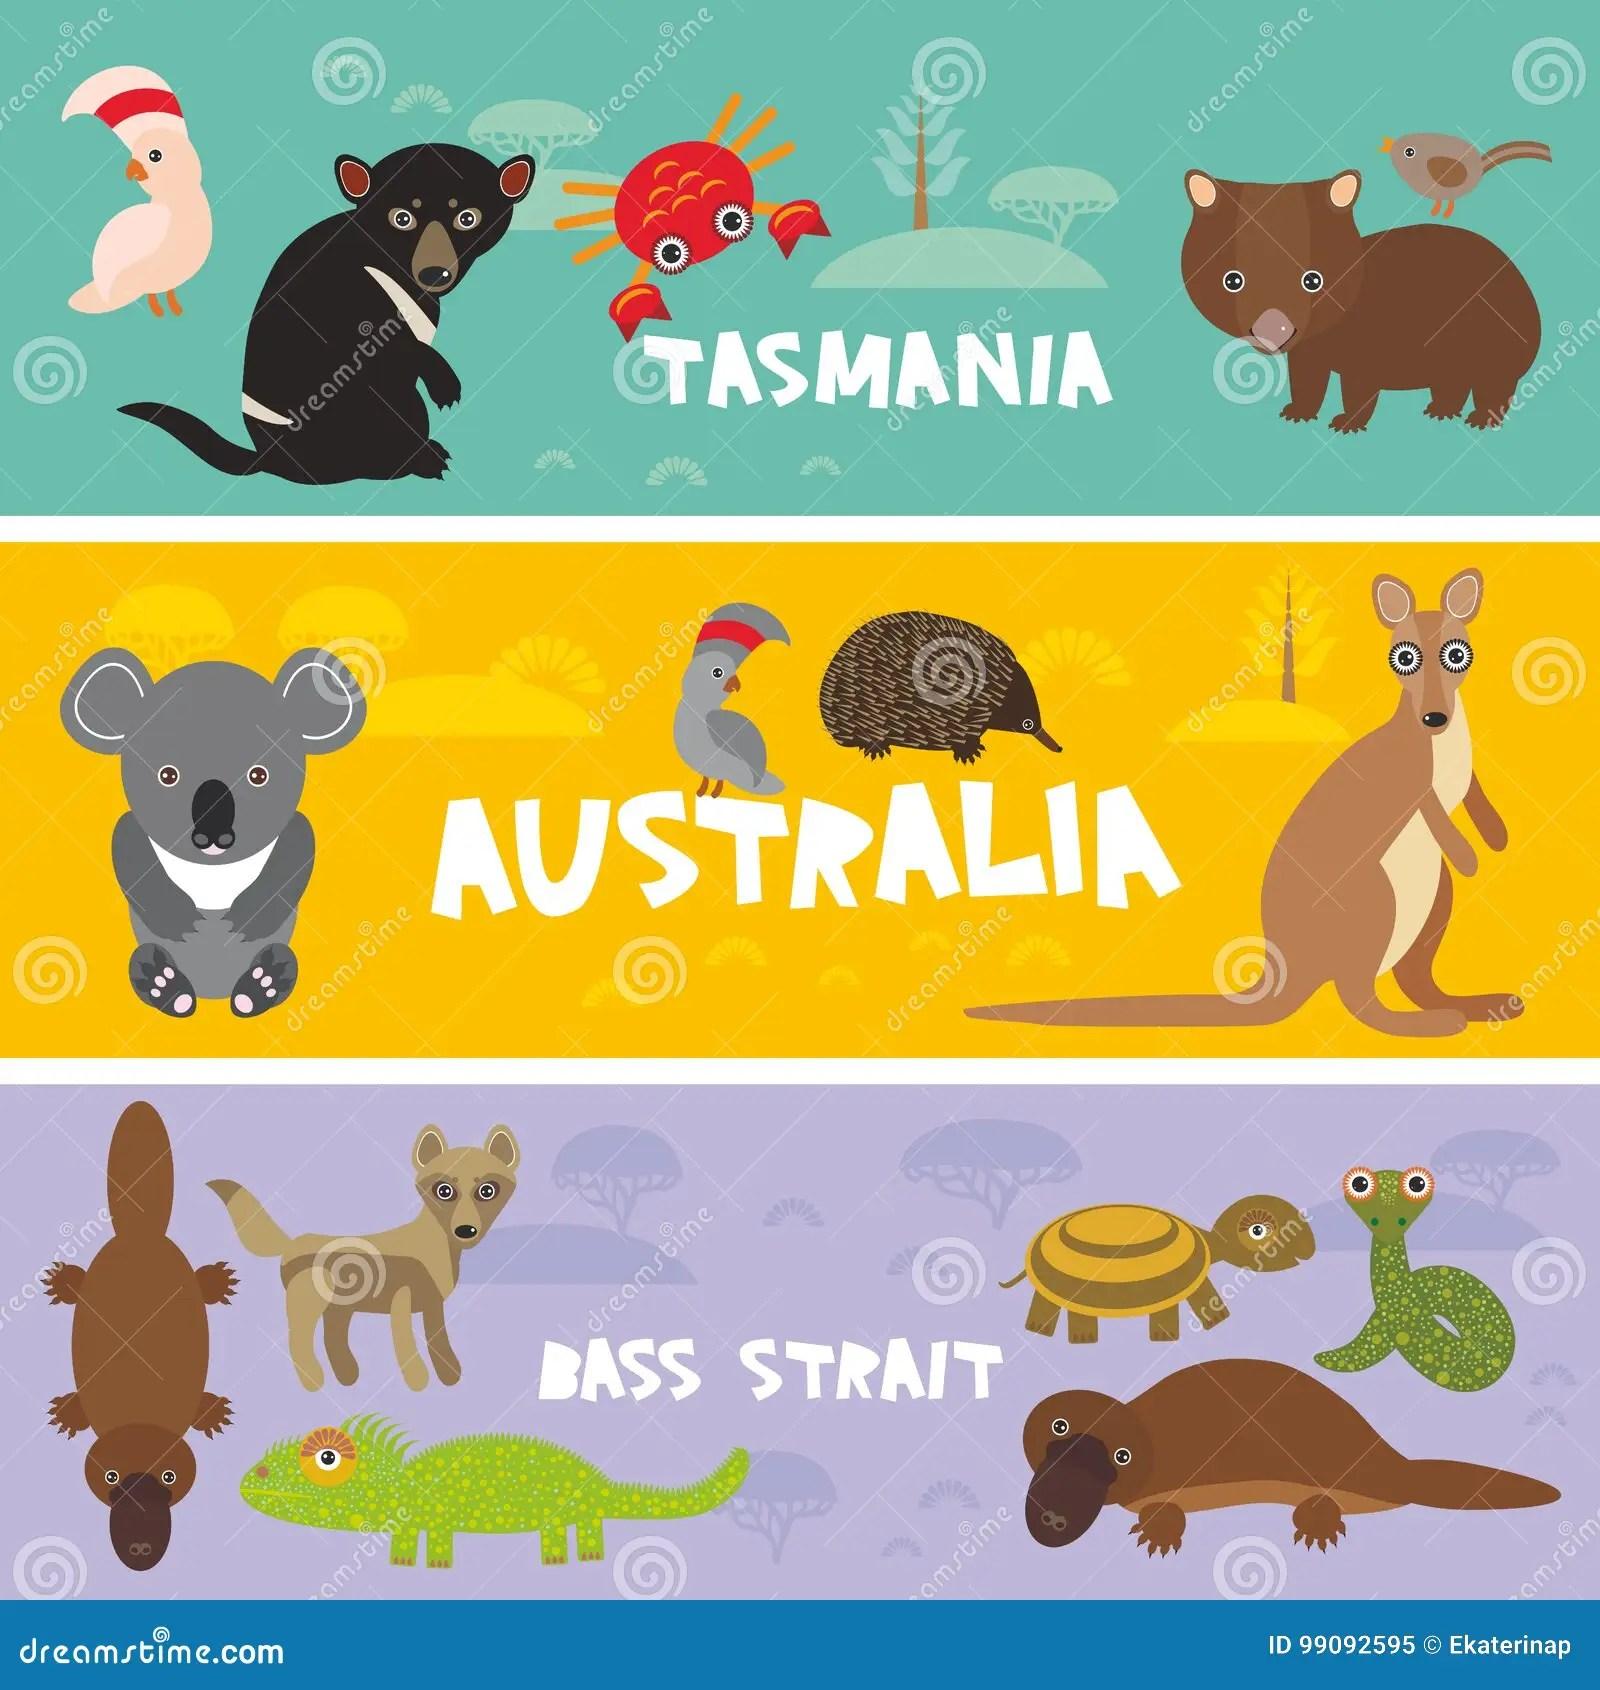 Cute Animals Set Echidna Koala Platypus Tasmanian Devil